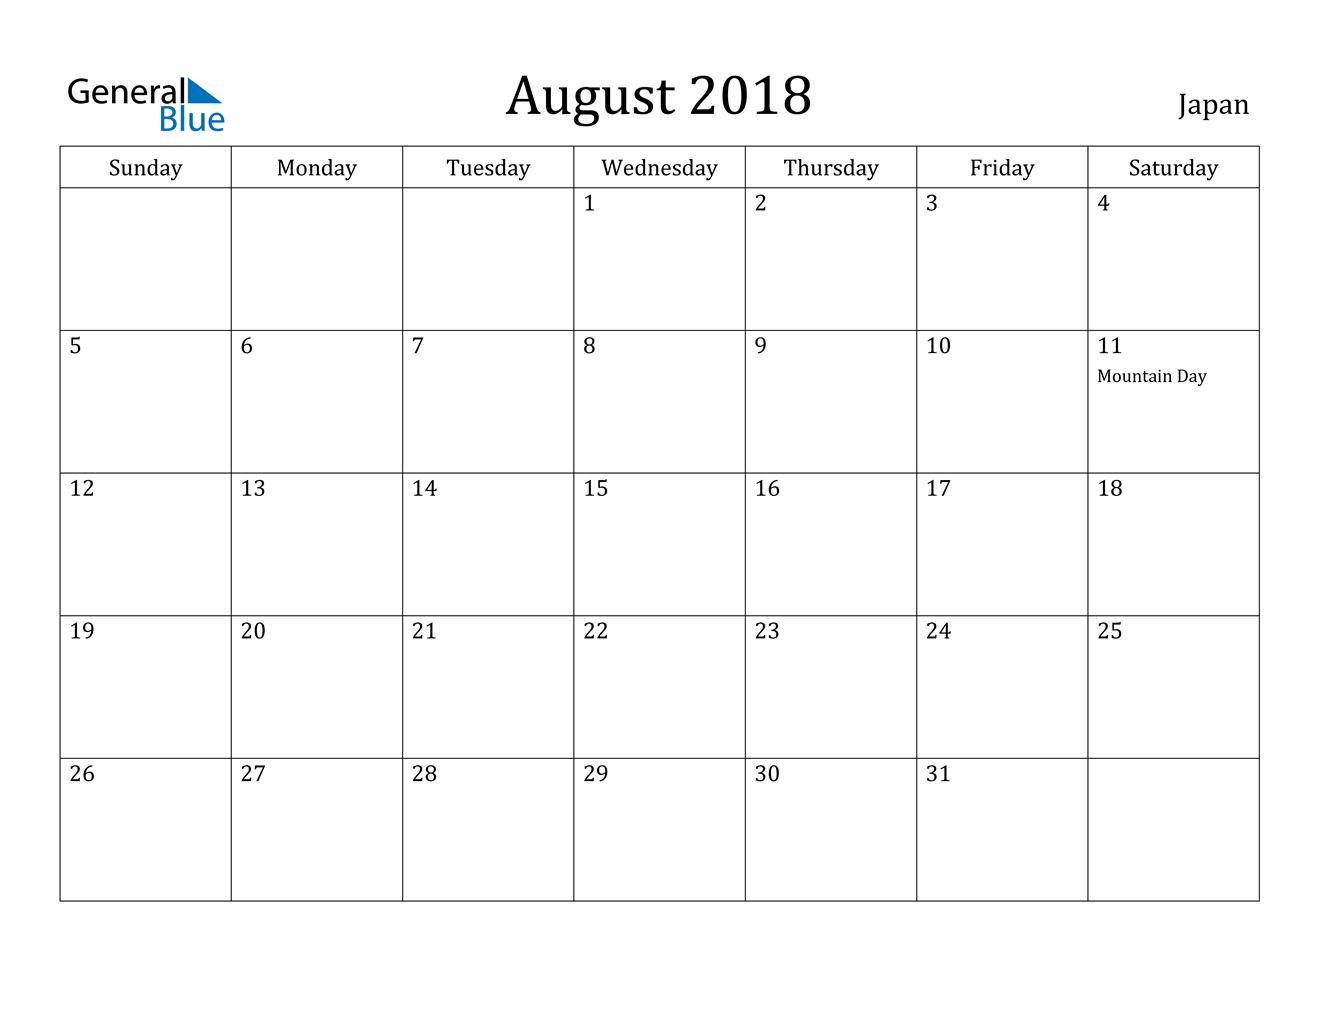 Image of August 2018 Japan Calendar with Holidays Calendar